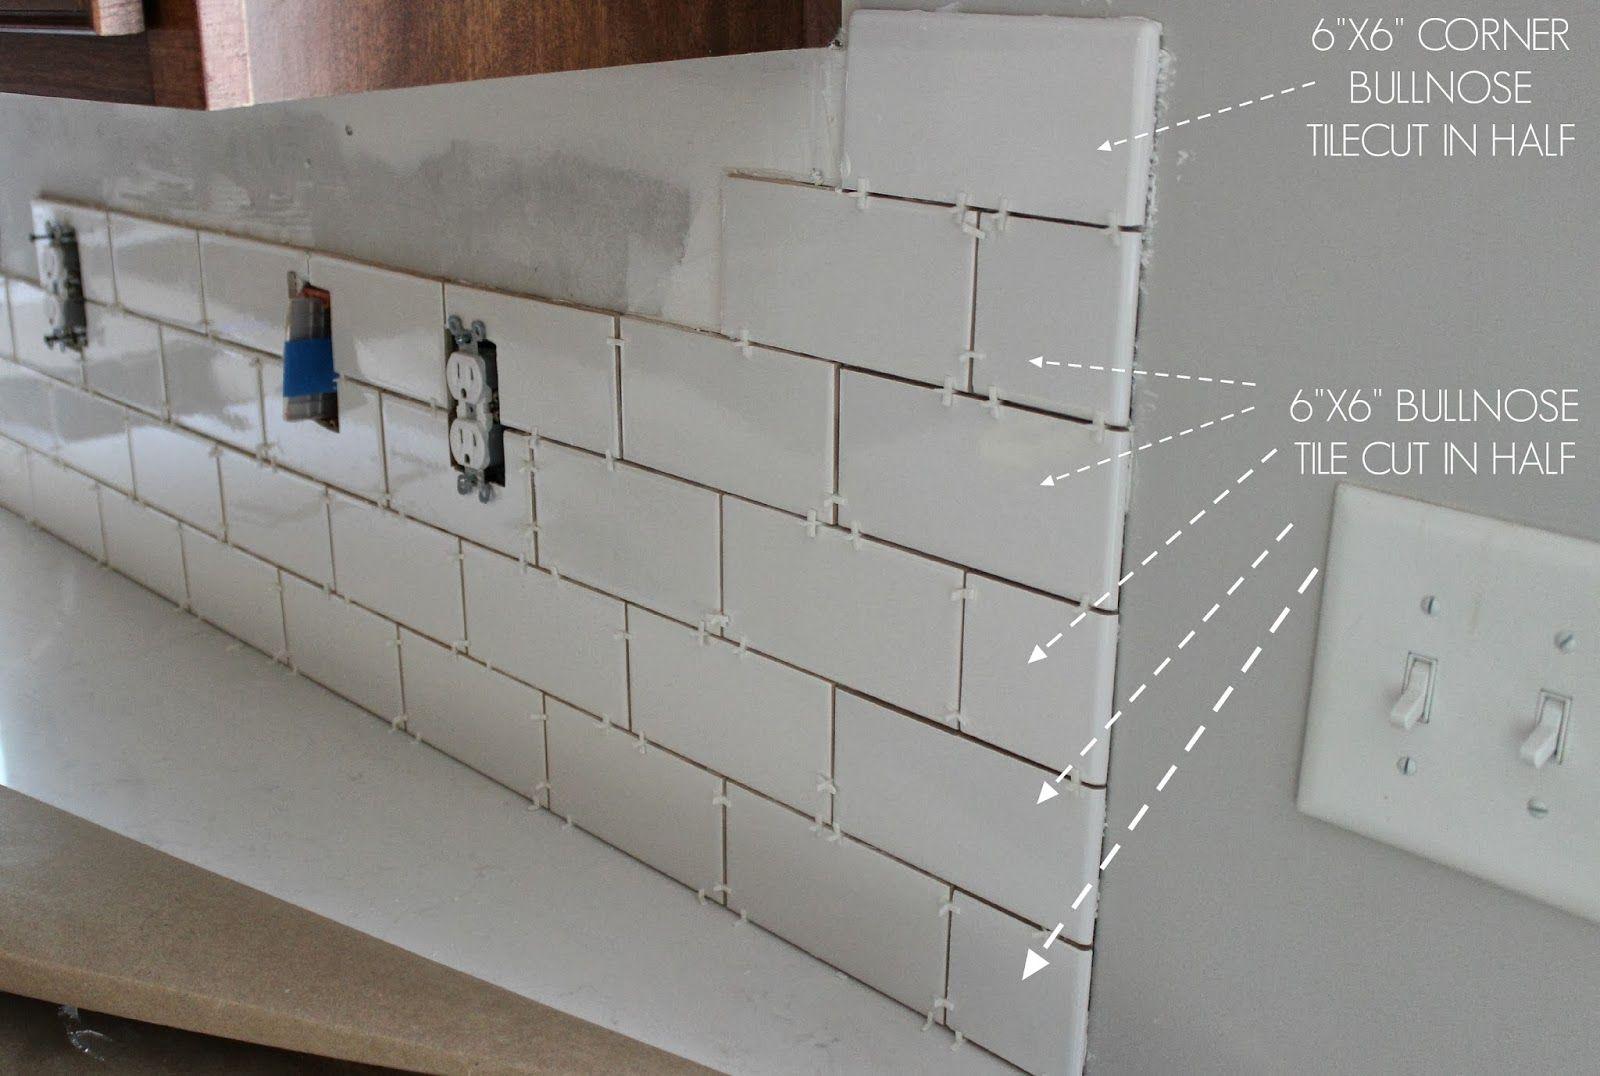 - Kitchen Chronicles: A DIY Subway Tile Backsplash, Part 1 Subway